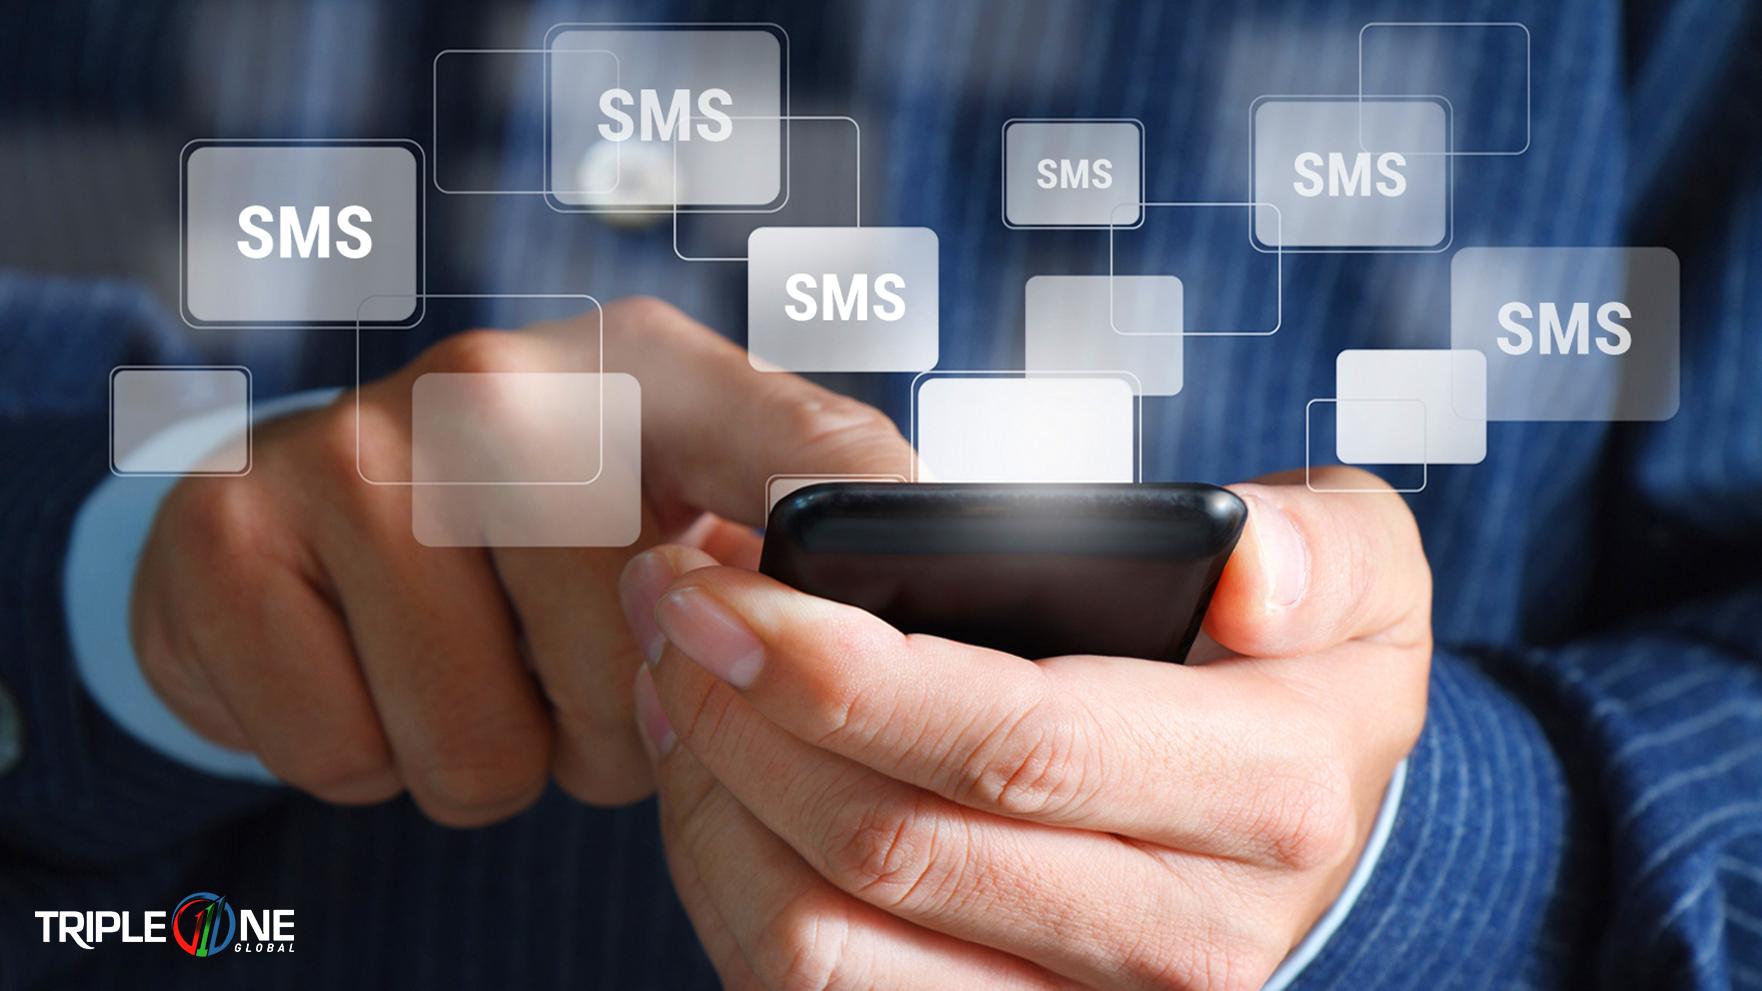 Vendor SMS Blast